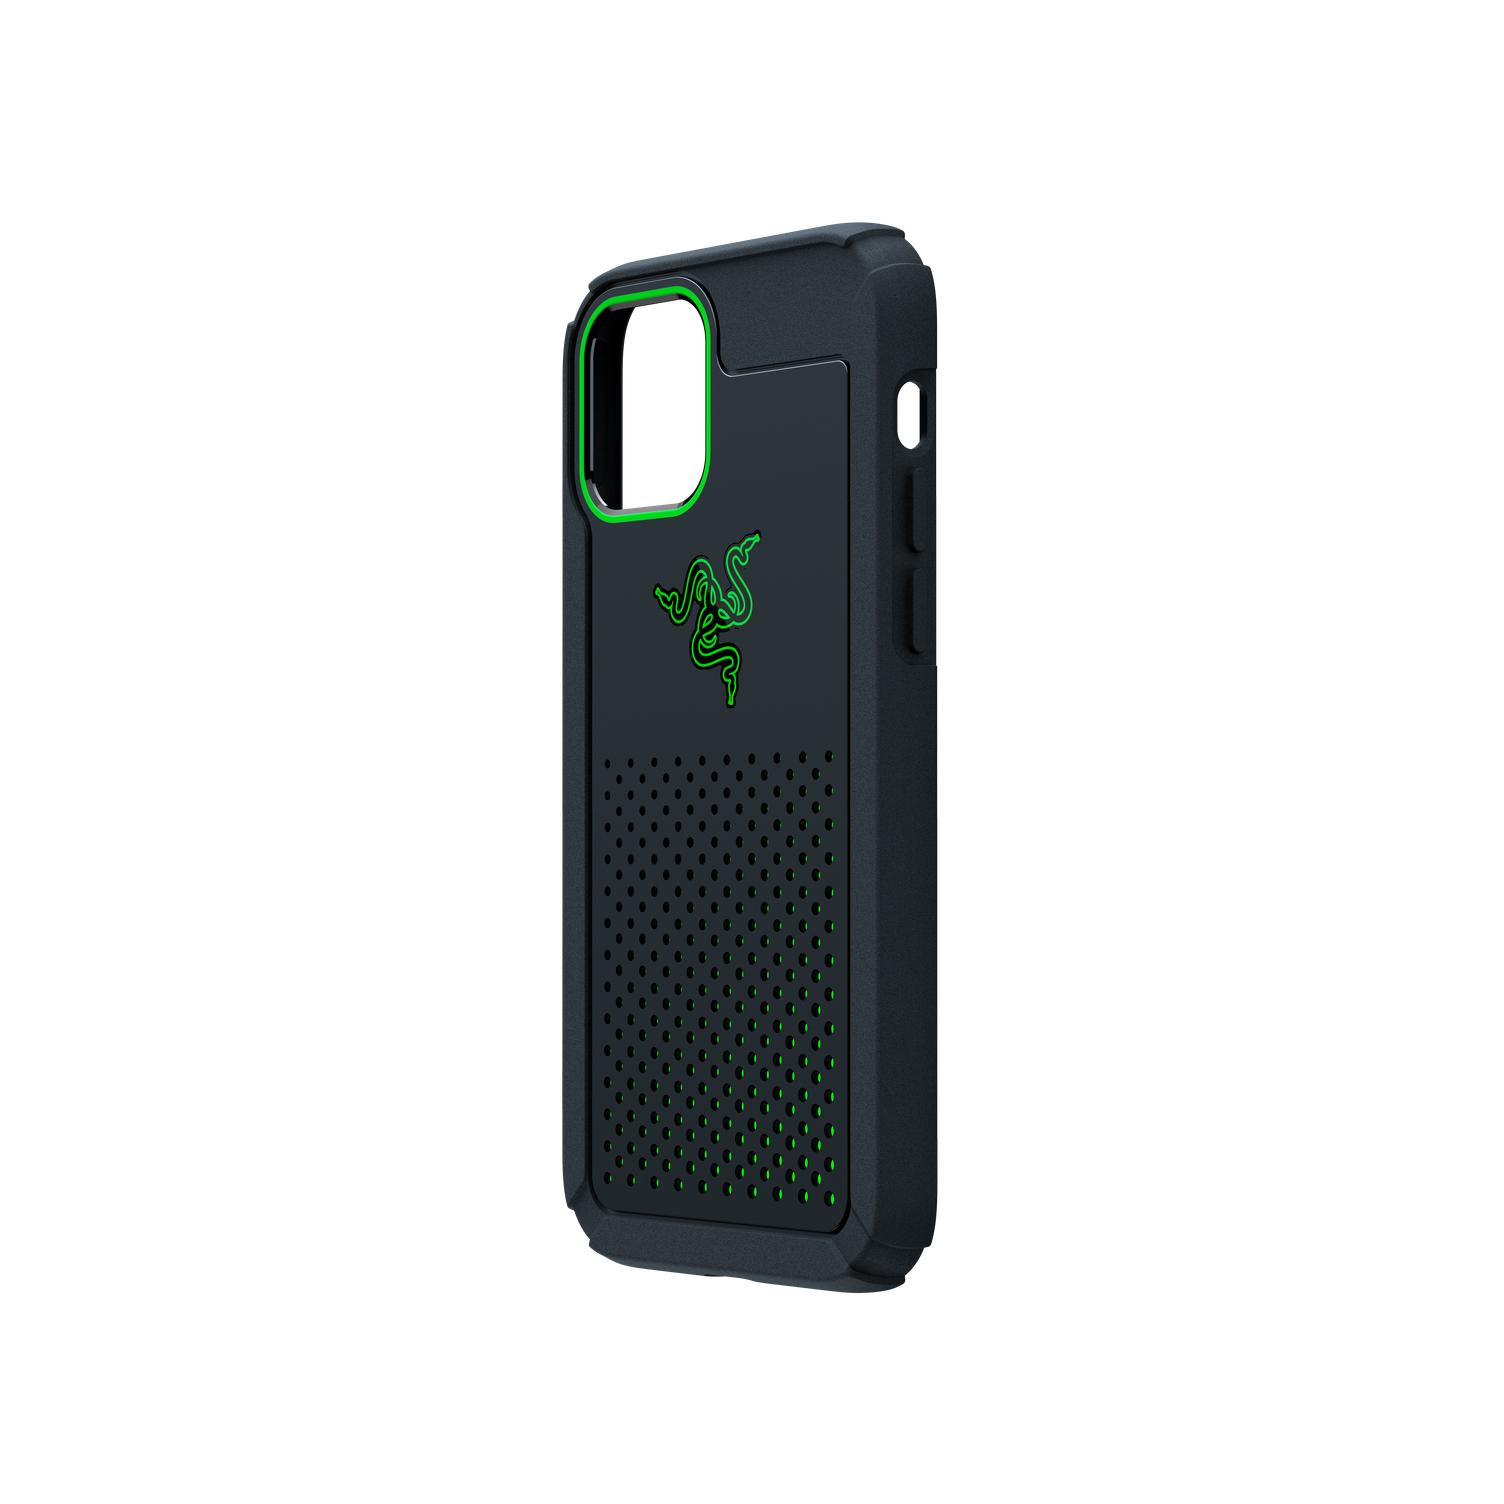 【RAZER 雷蛇】ARCTECH PRO冰鎧專業版手機殼FOR IPHONE12 PRO (6.1吋)